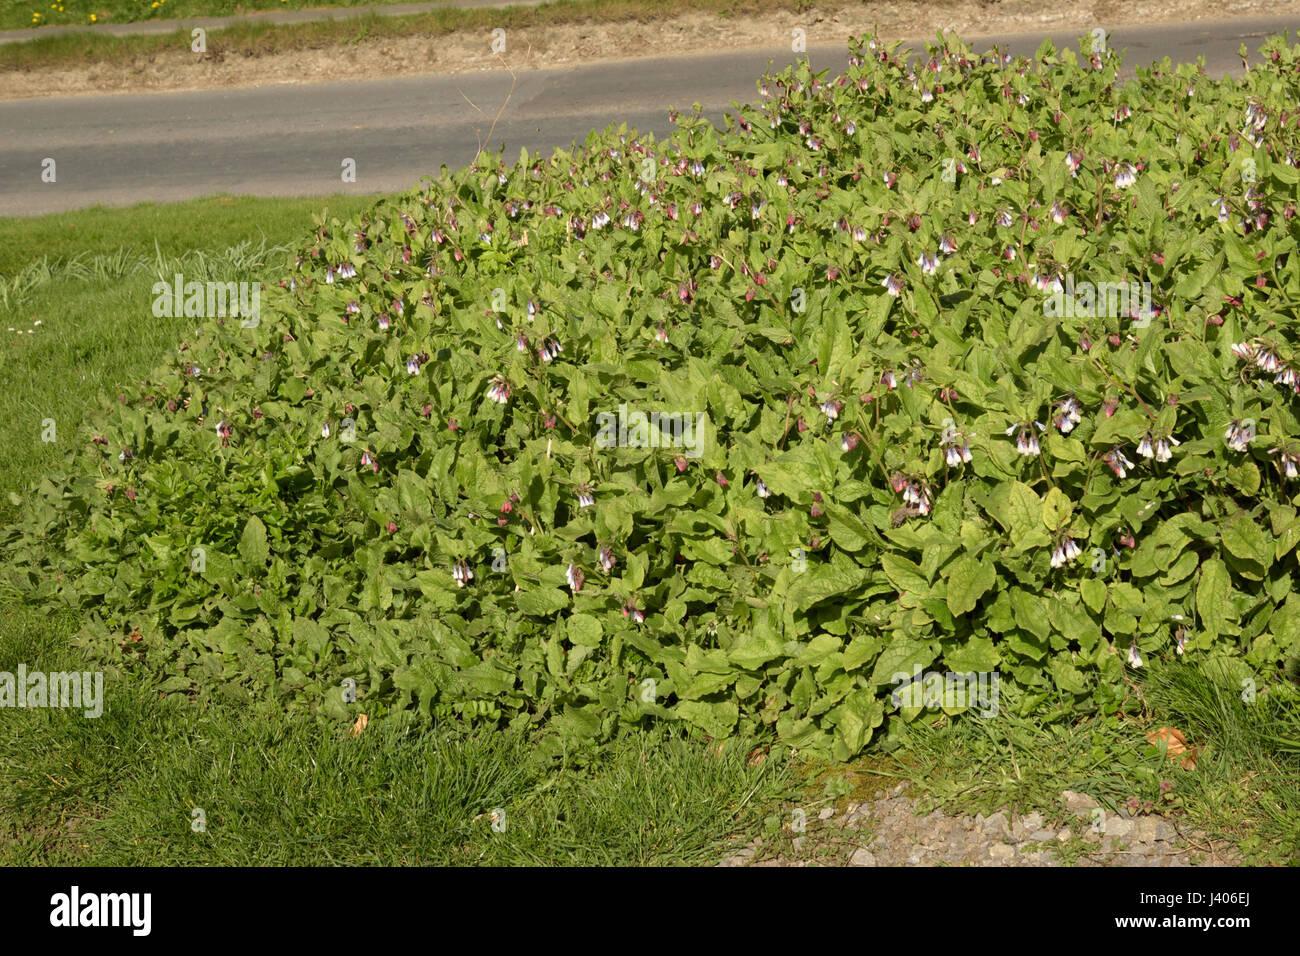 Hidcote Comfrey, Symphytum x hidcotense on a road verge - Stock Image